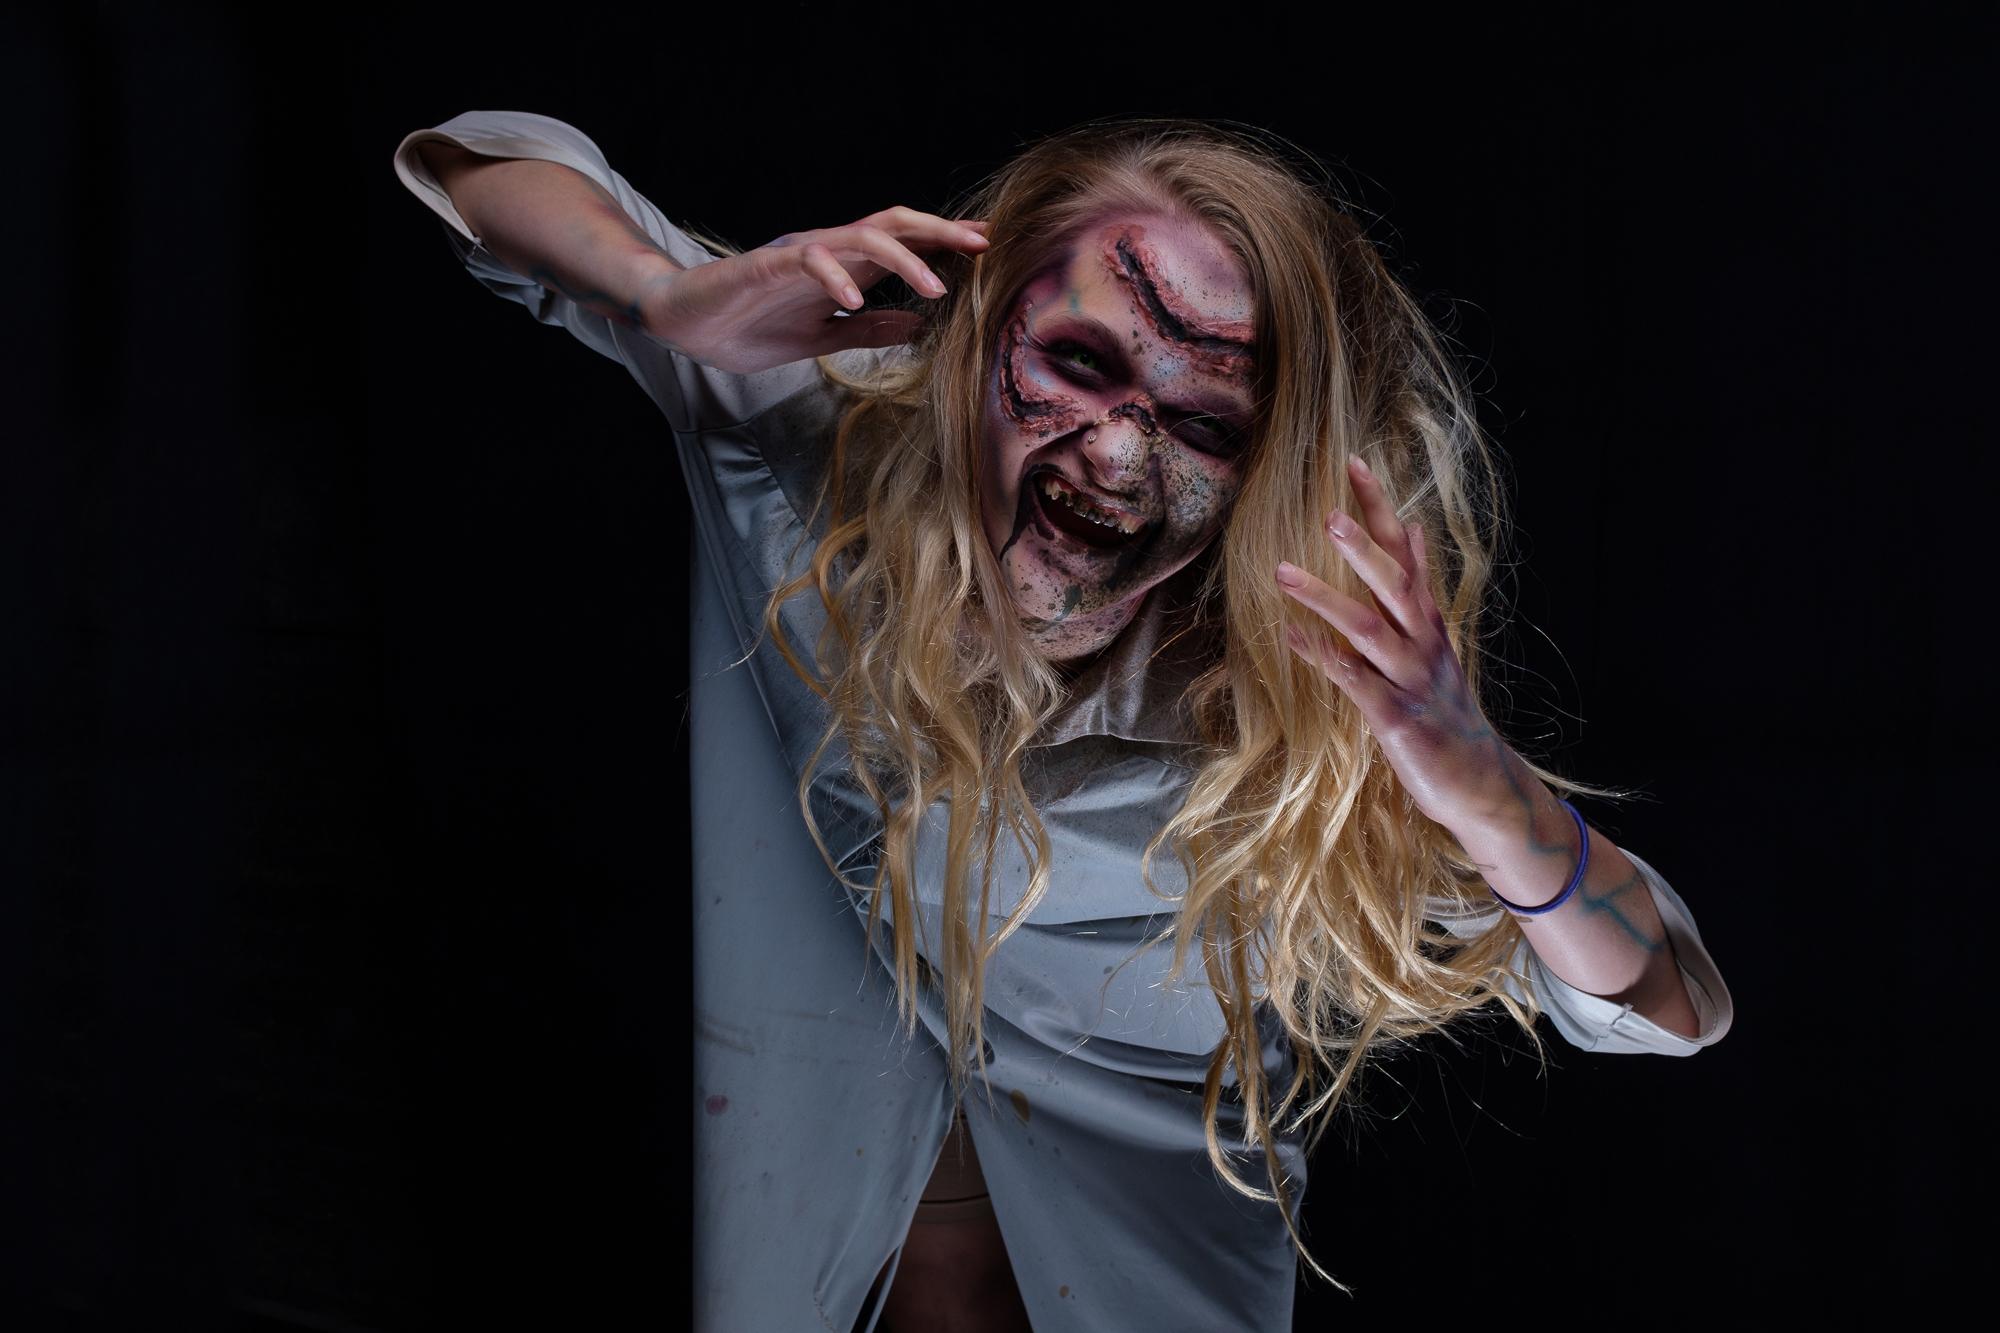 Photo by Danny Alexander  Makeup: Myself  Actress: Victoria Green